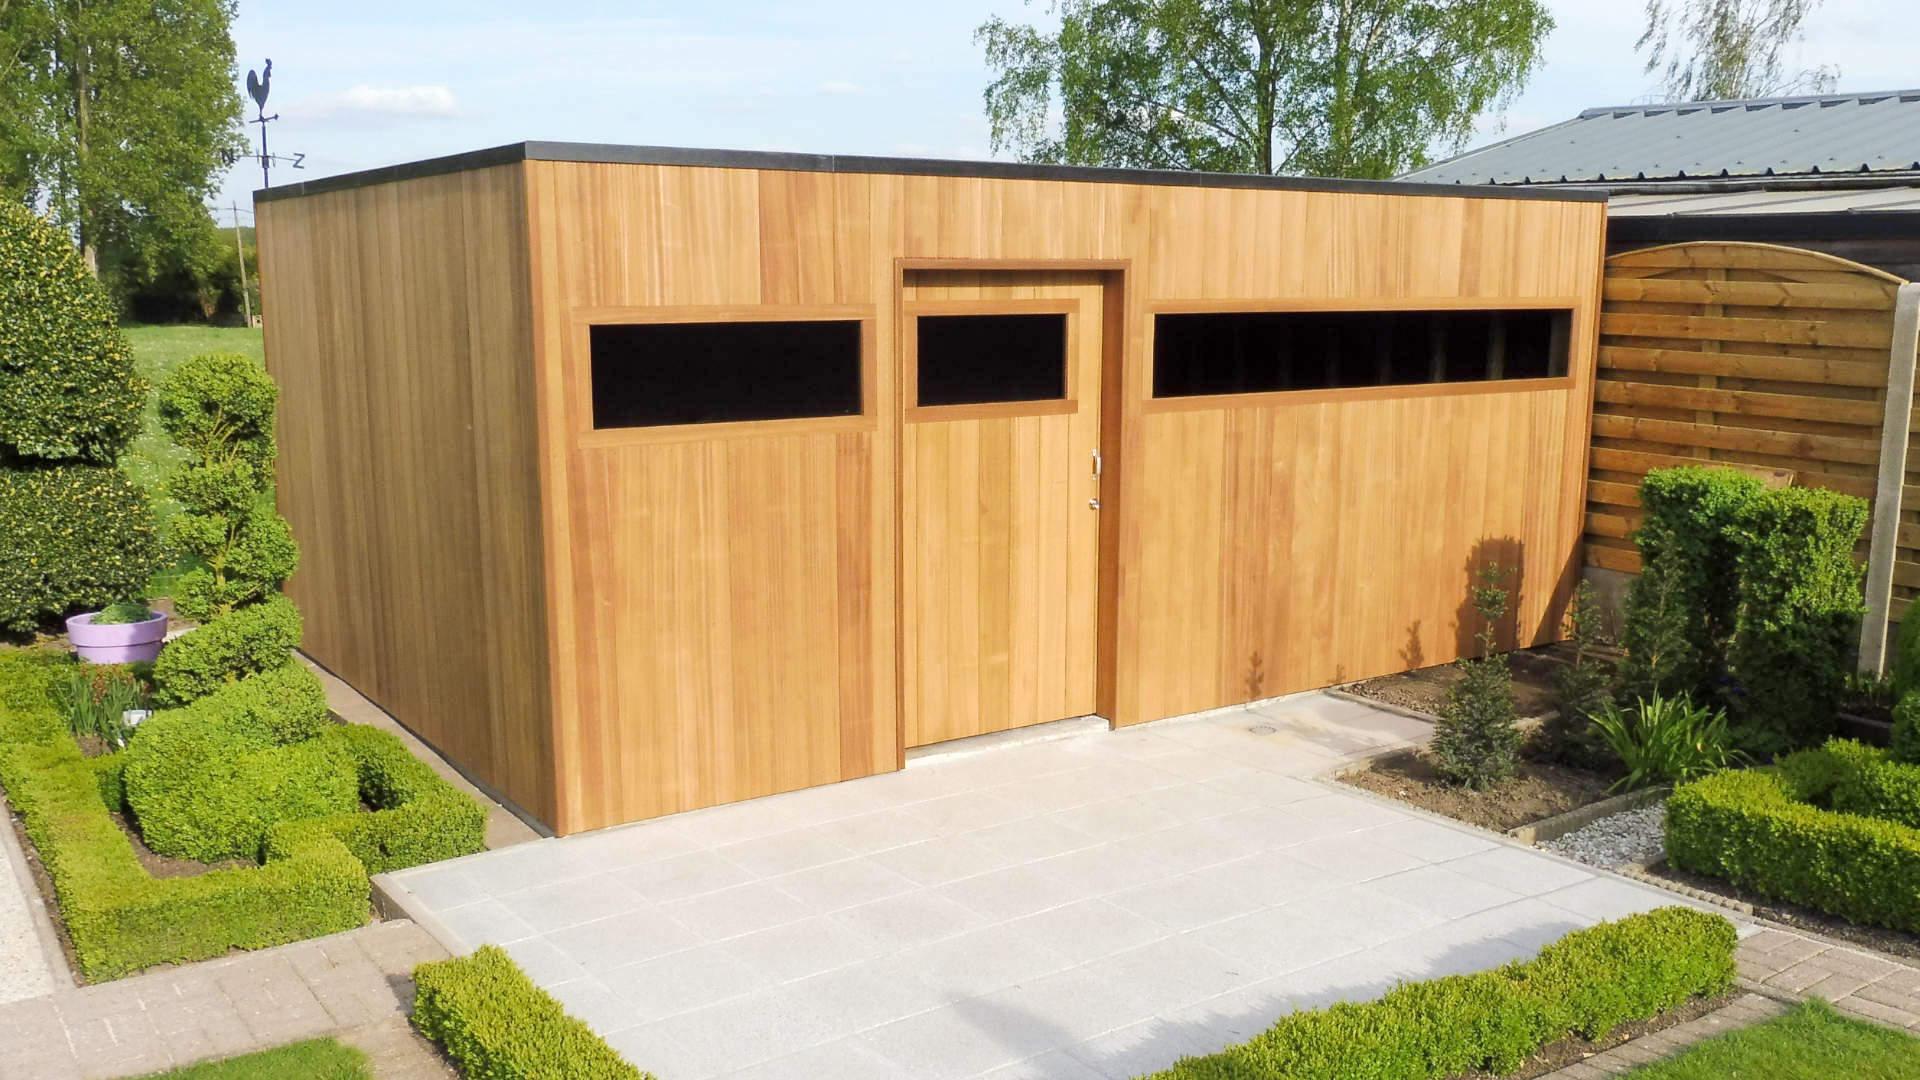 Belgo-Garant-tuinhuizen-hout-maken